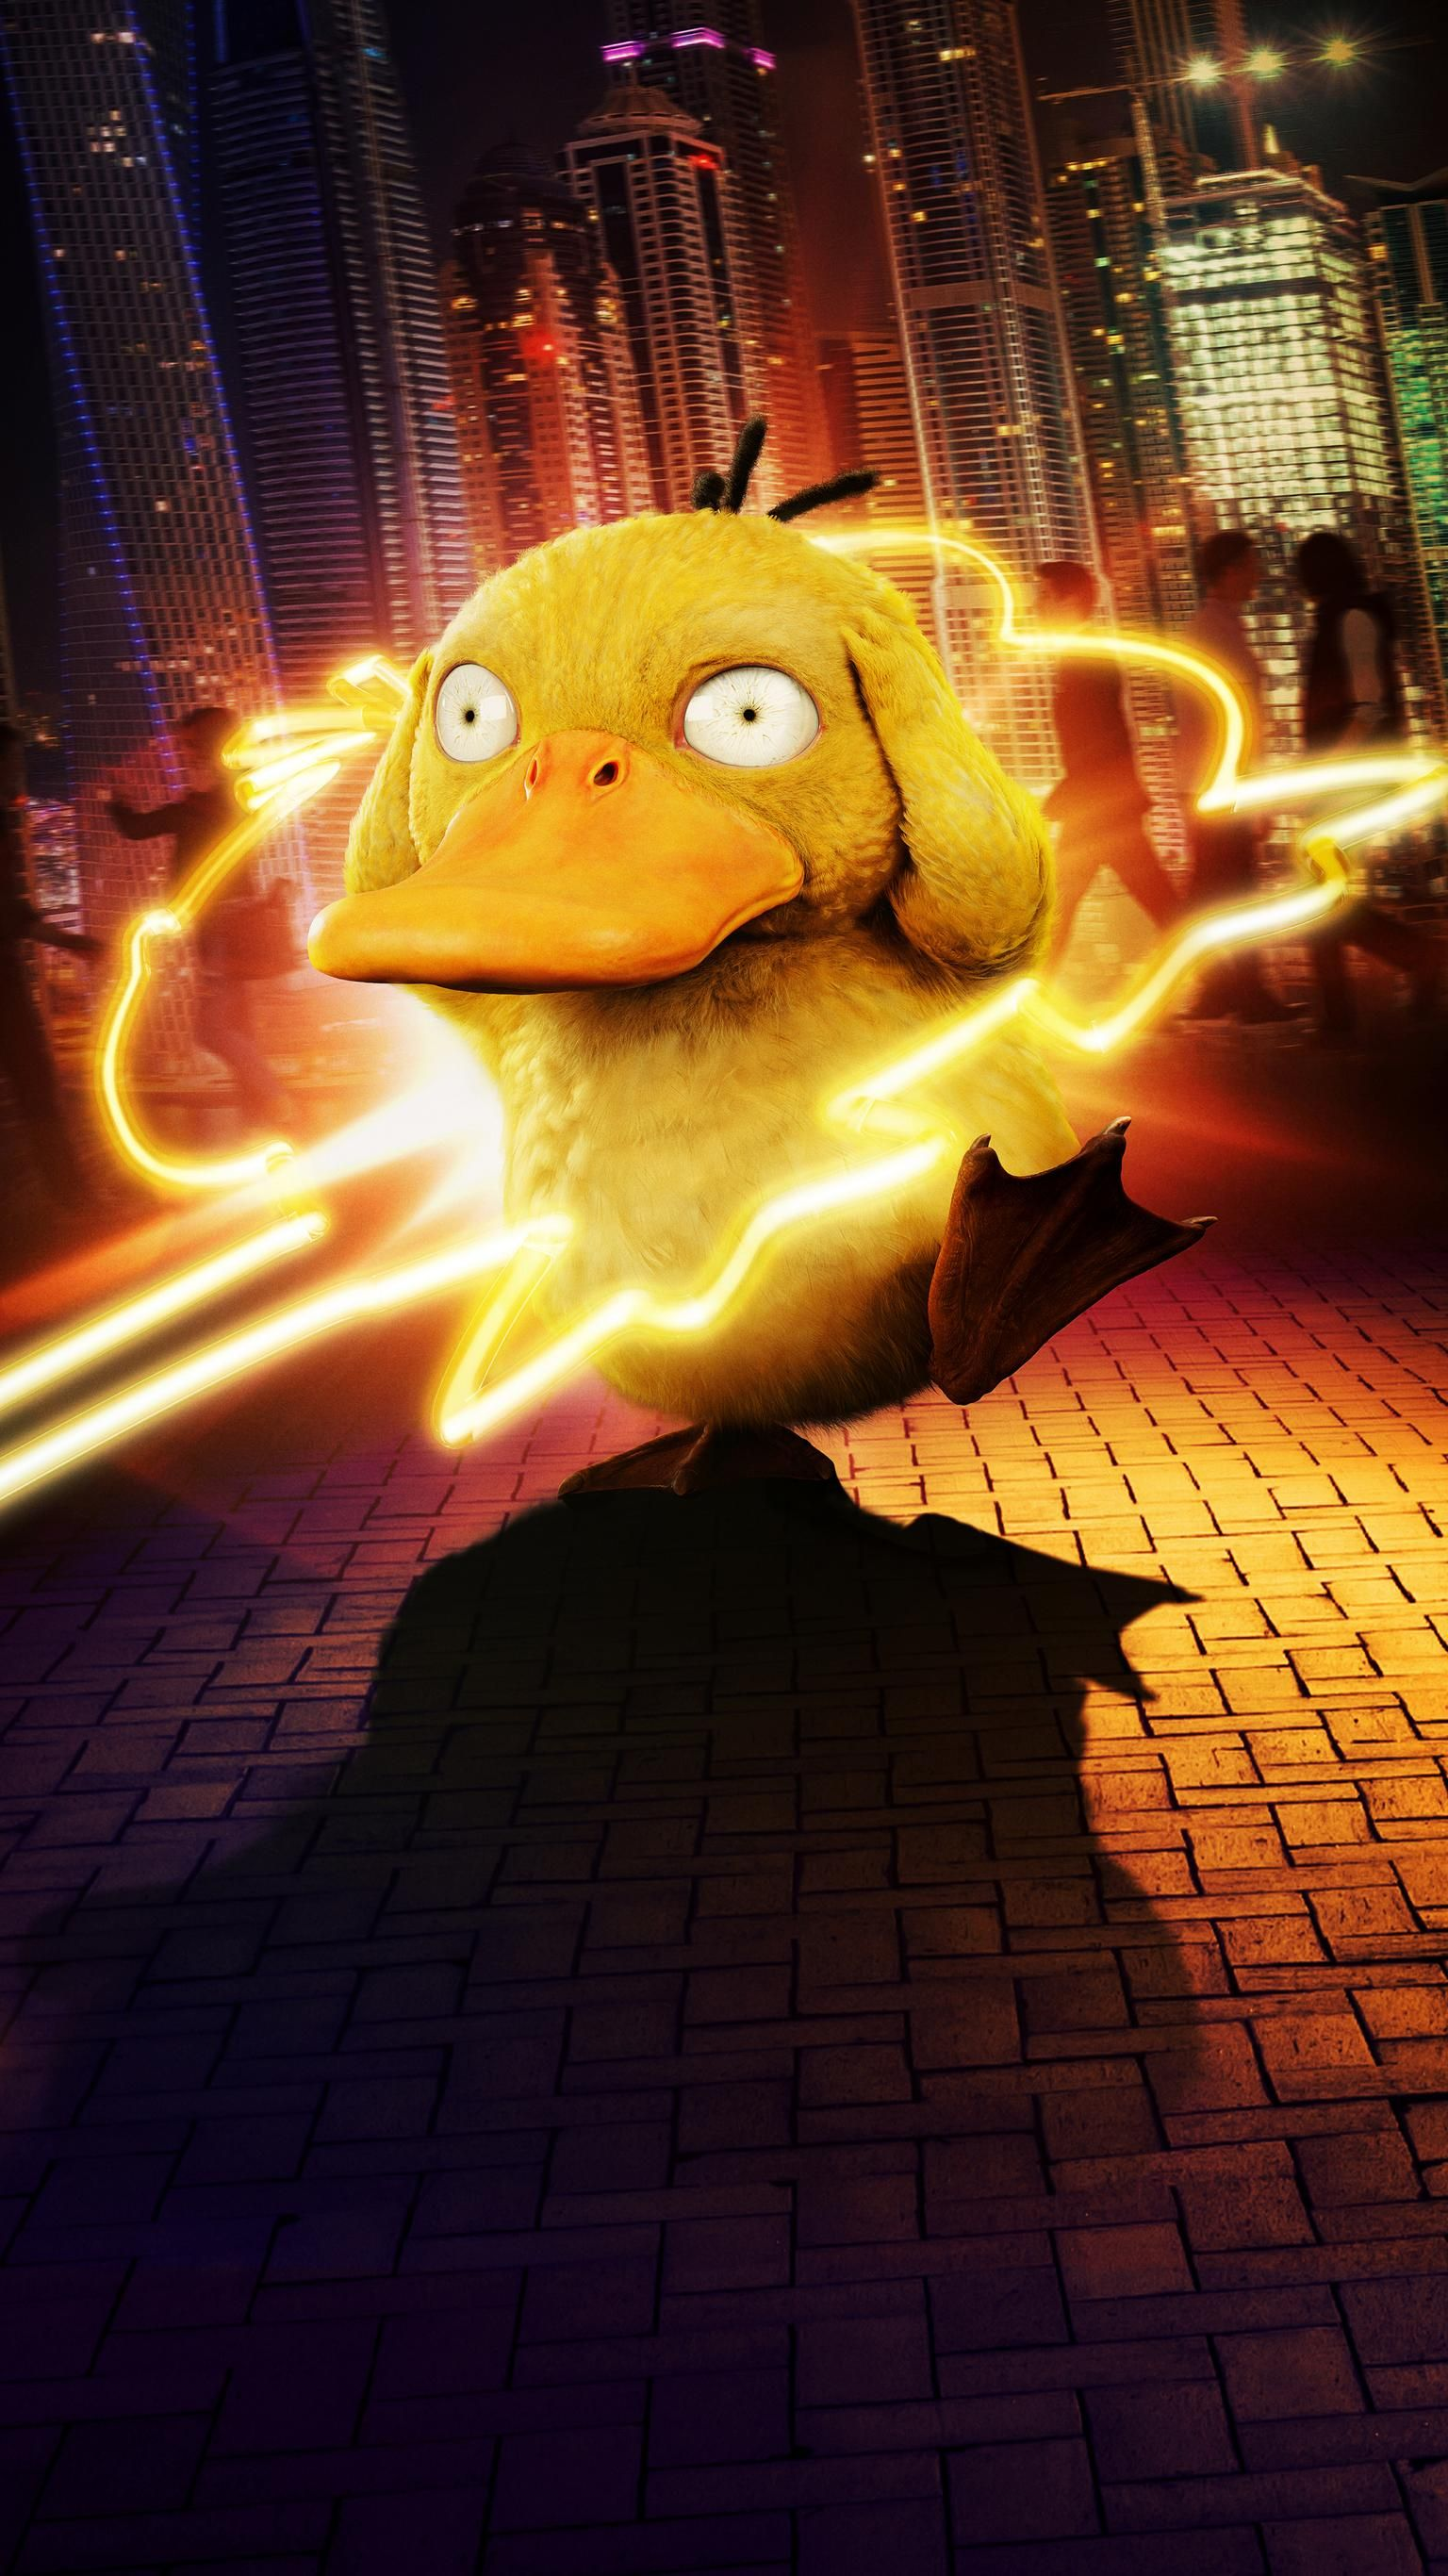 Pokémon Detective Pikachu (2019) Phone Wallpaper Cute